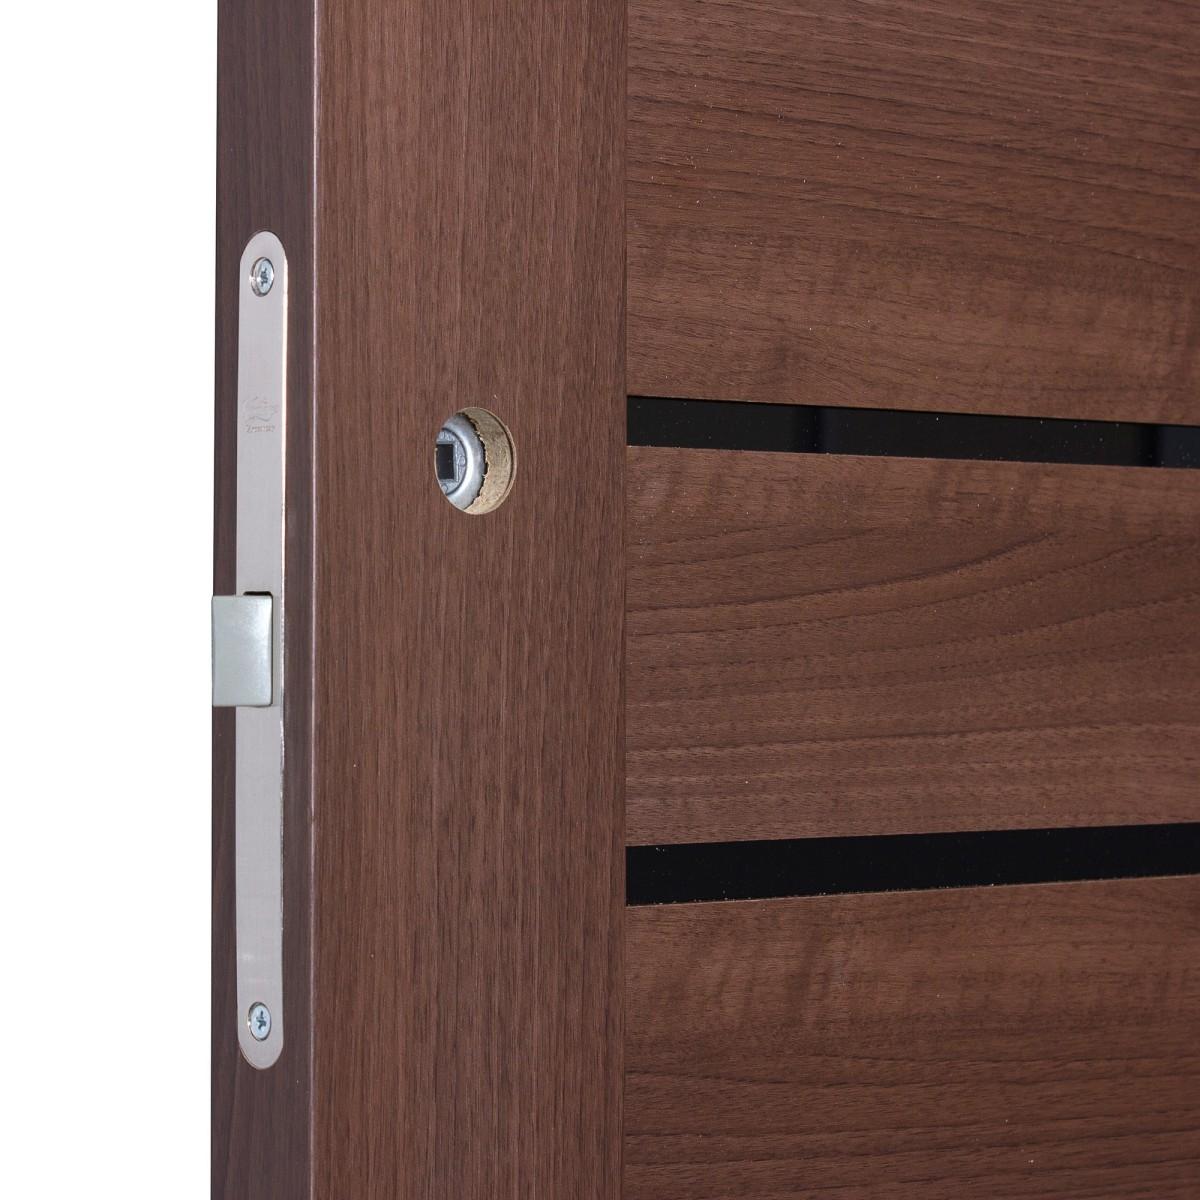 Дверь Межкомнатная Глухая Artens Велдон 80x200 Цвет Мокко Без Фурнитуры